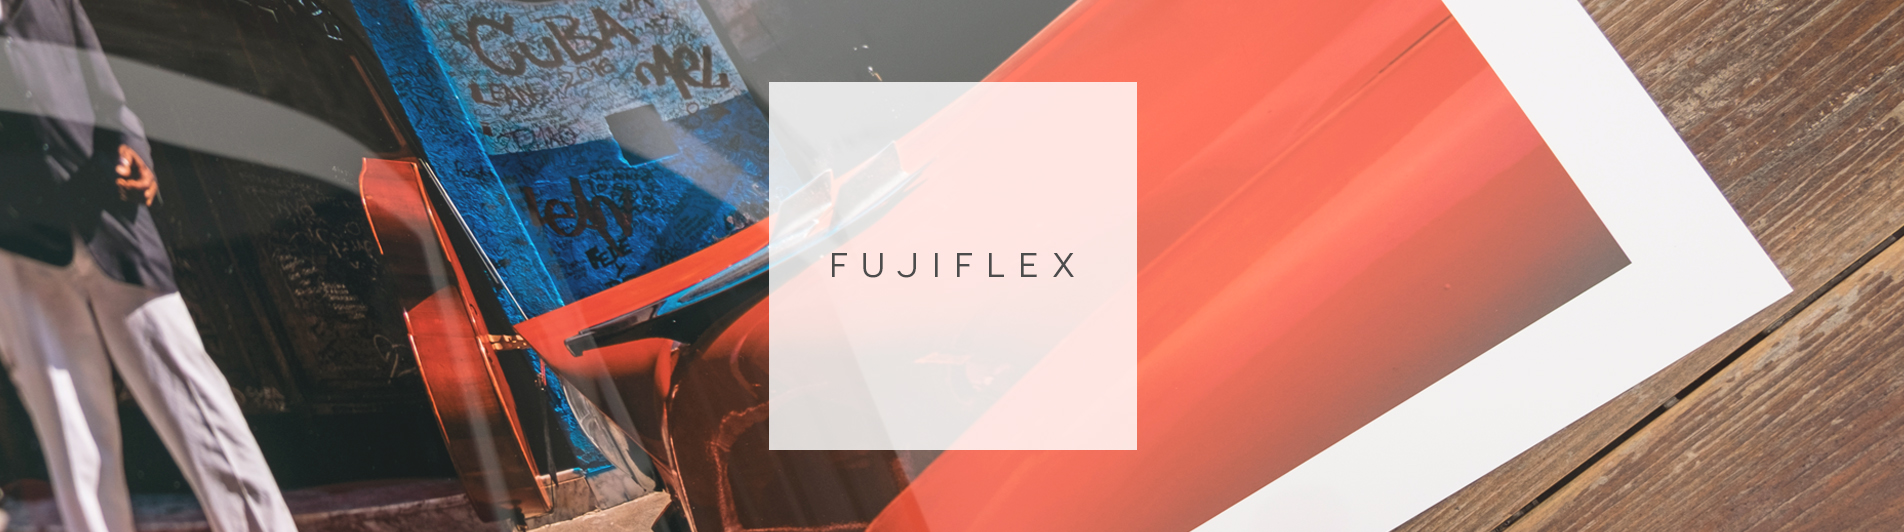 Fujiflex